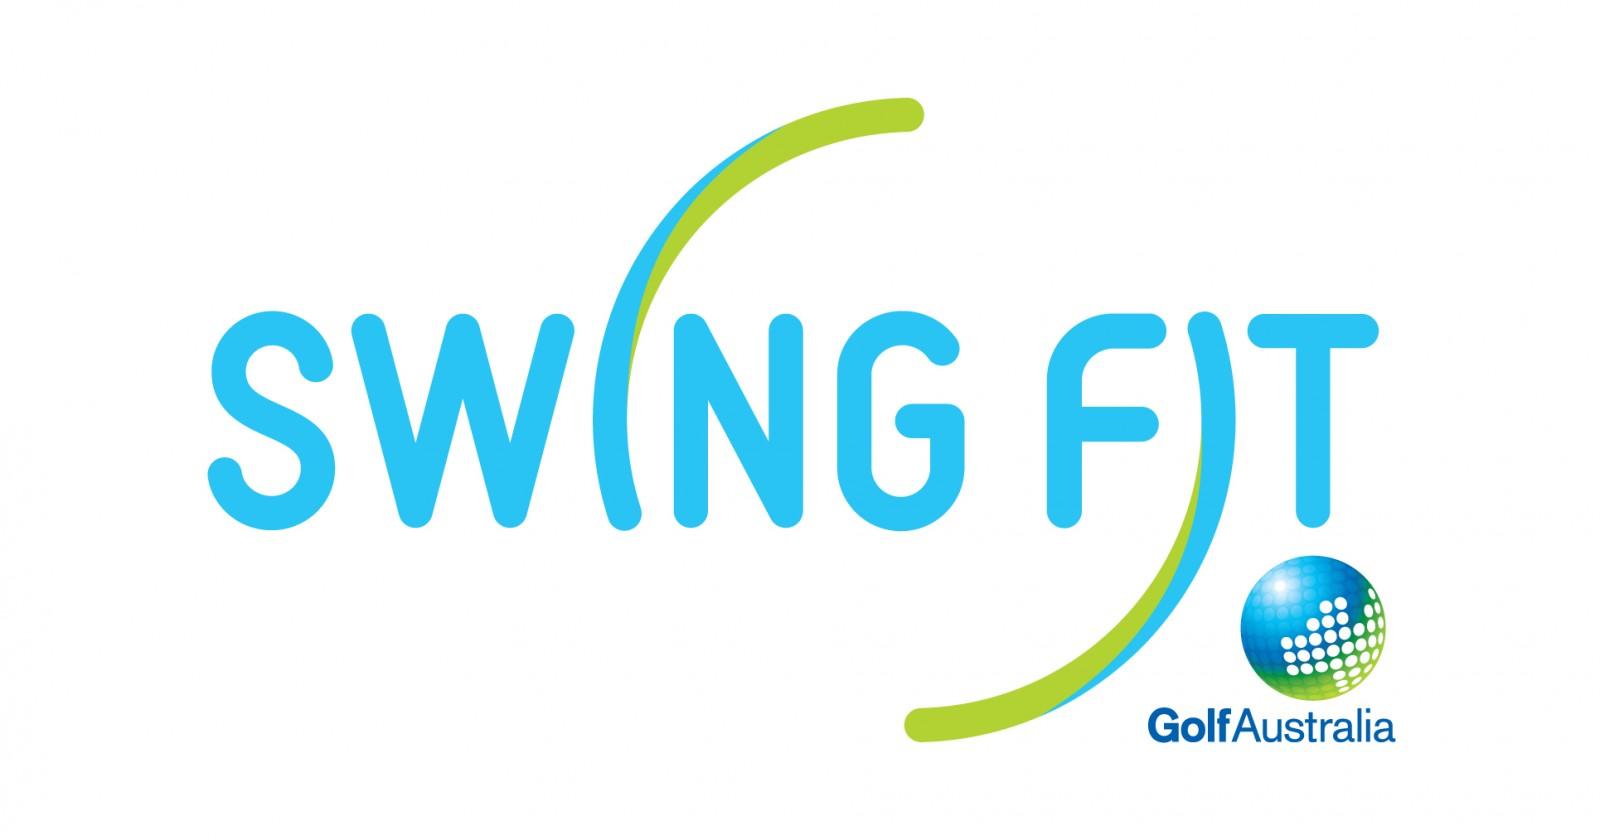 SwingFit is Golf Australia's flagship program for women.